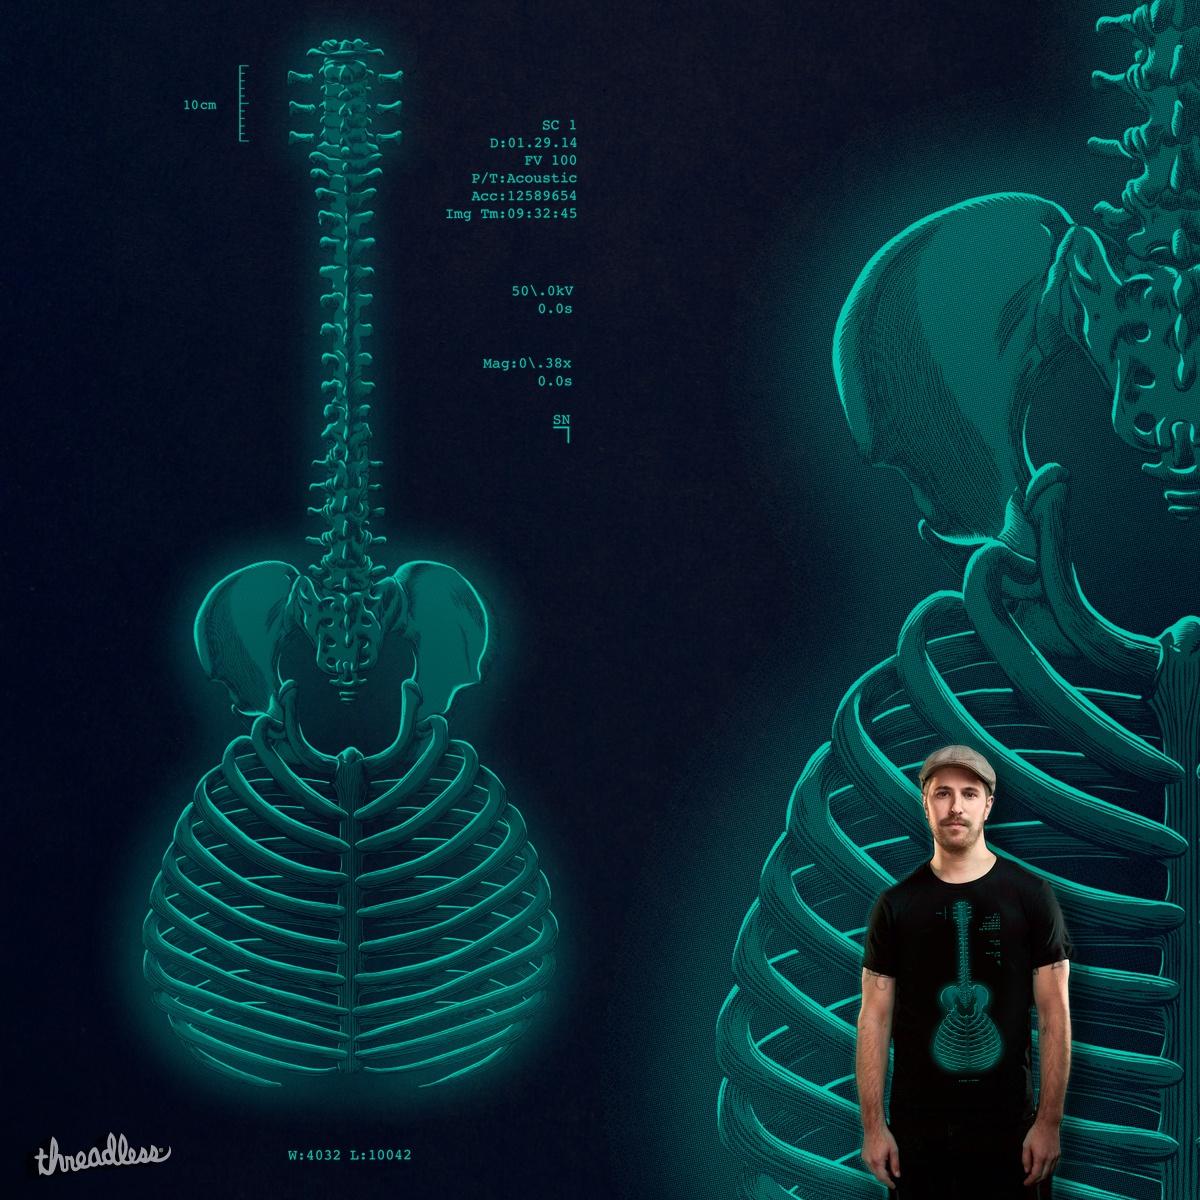 Acoustic Radiograph by v_calahan on Threadless